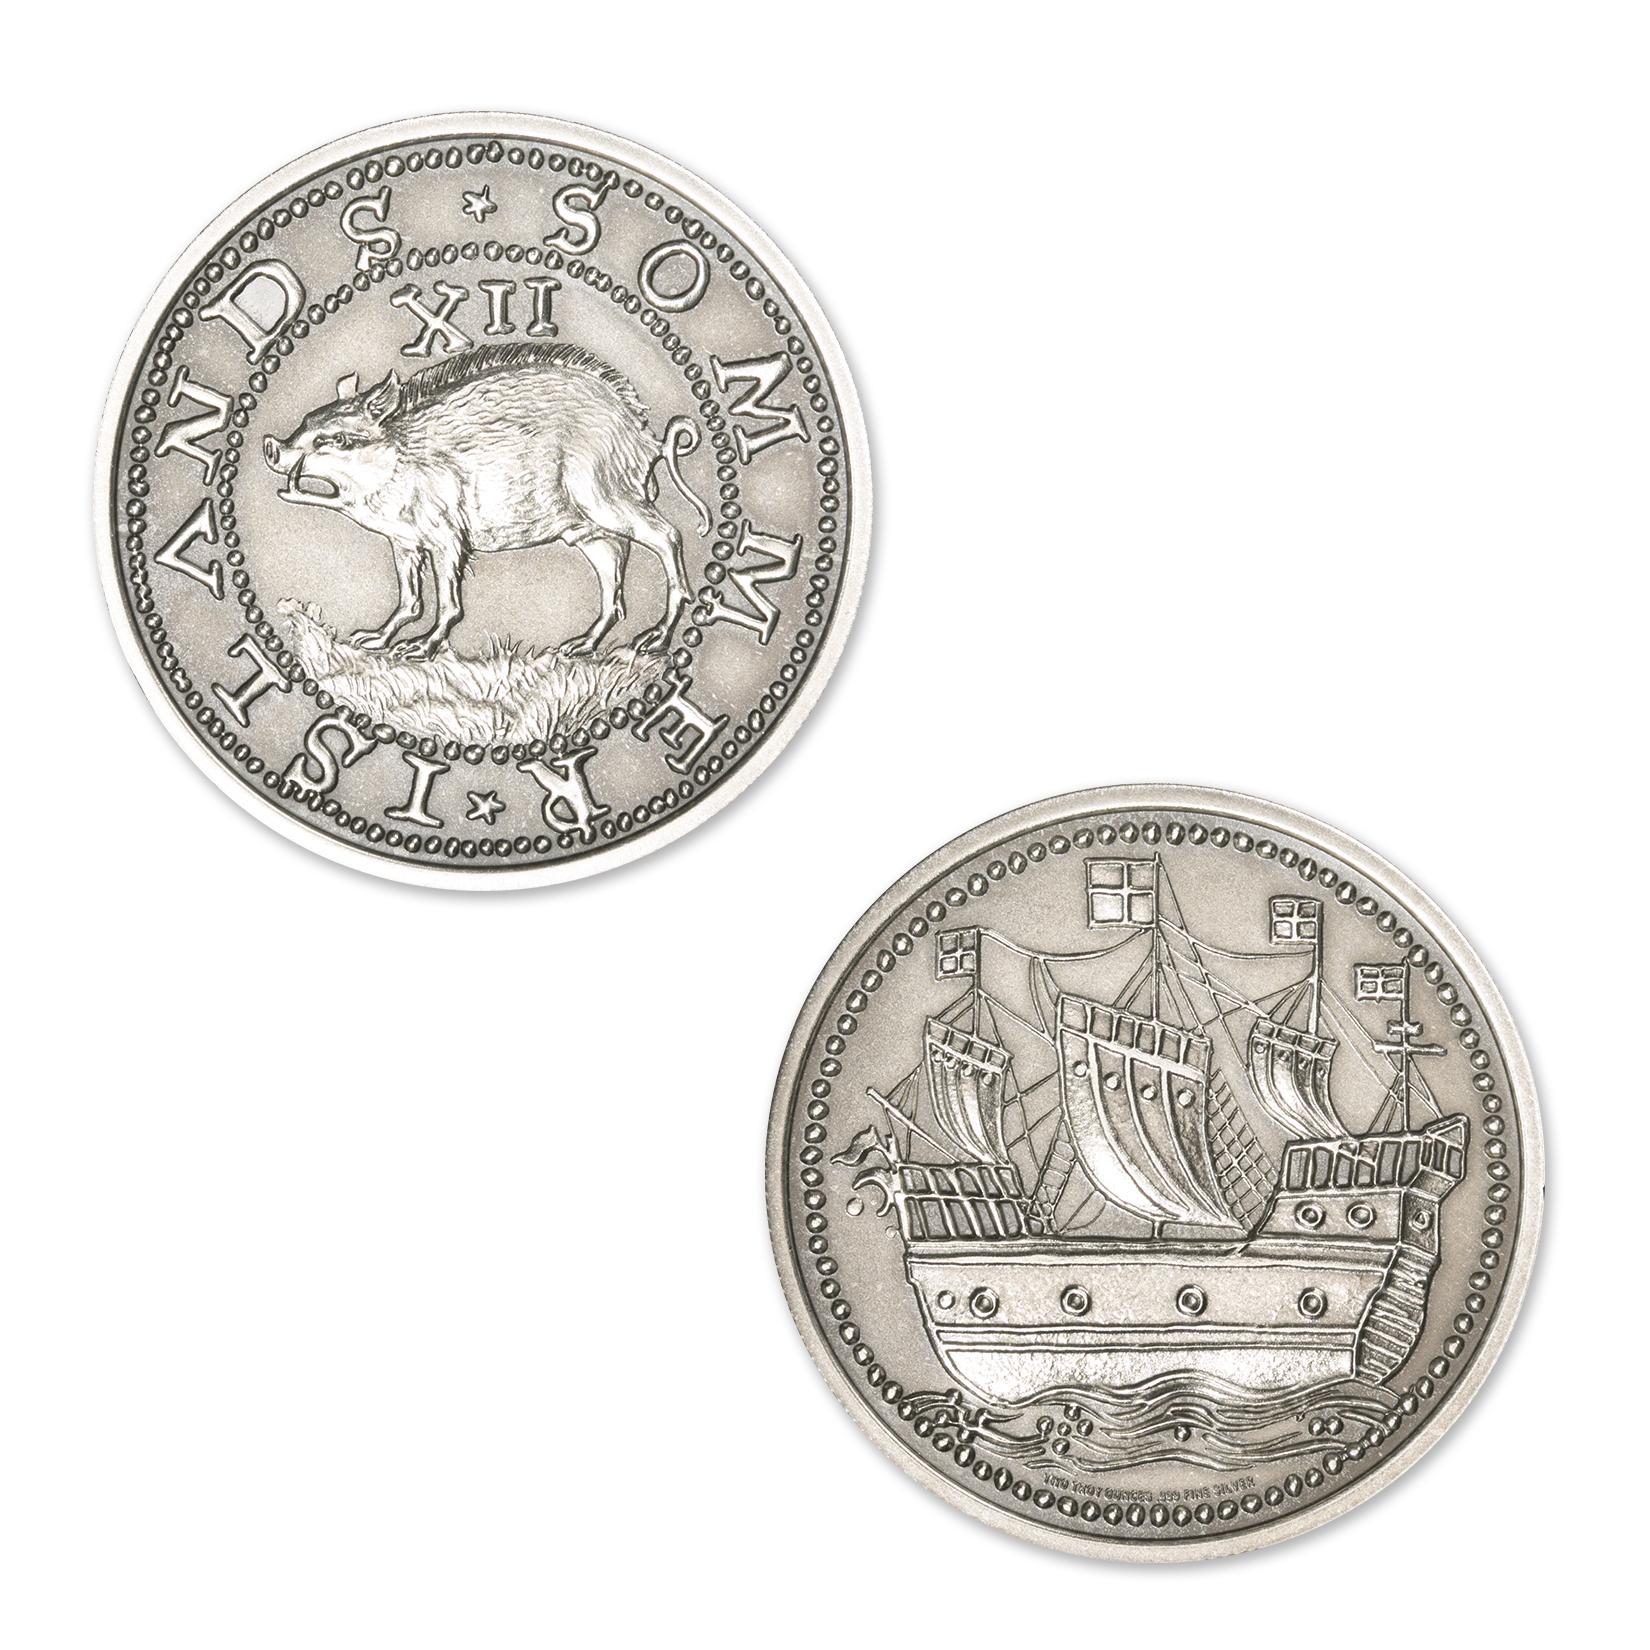 SOMMER ISLANDS TWELVE PENCE (HOGGE MONEY) – 2 TROY OUNCES – 39MM (ANTIQUED)